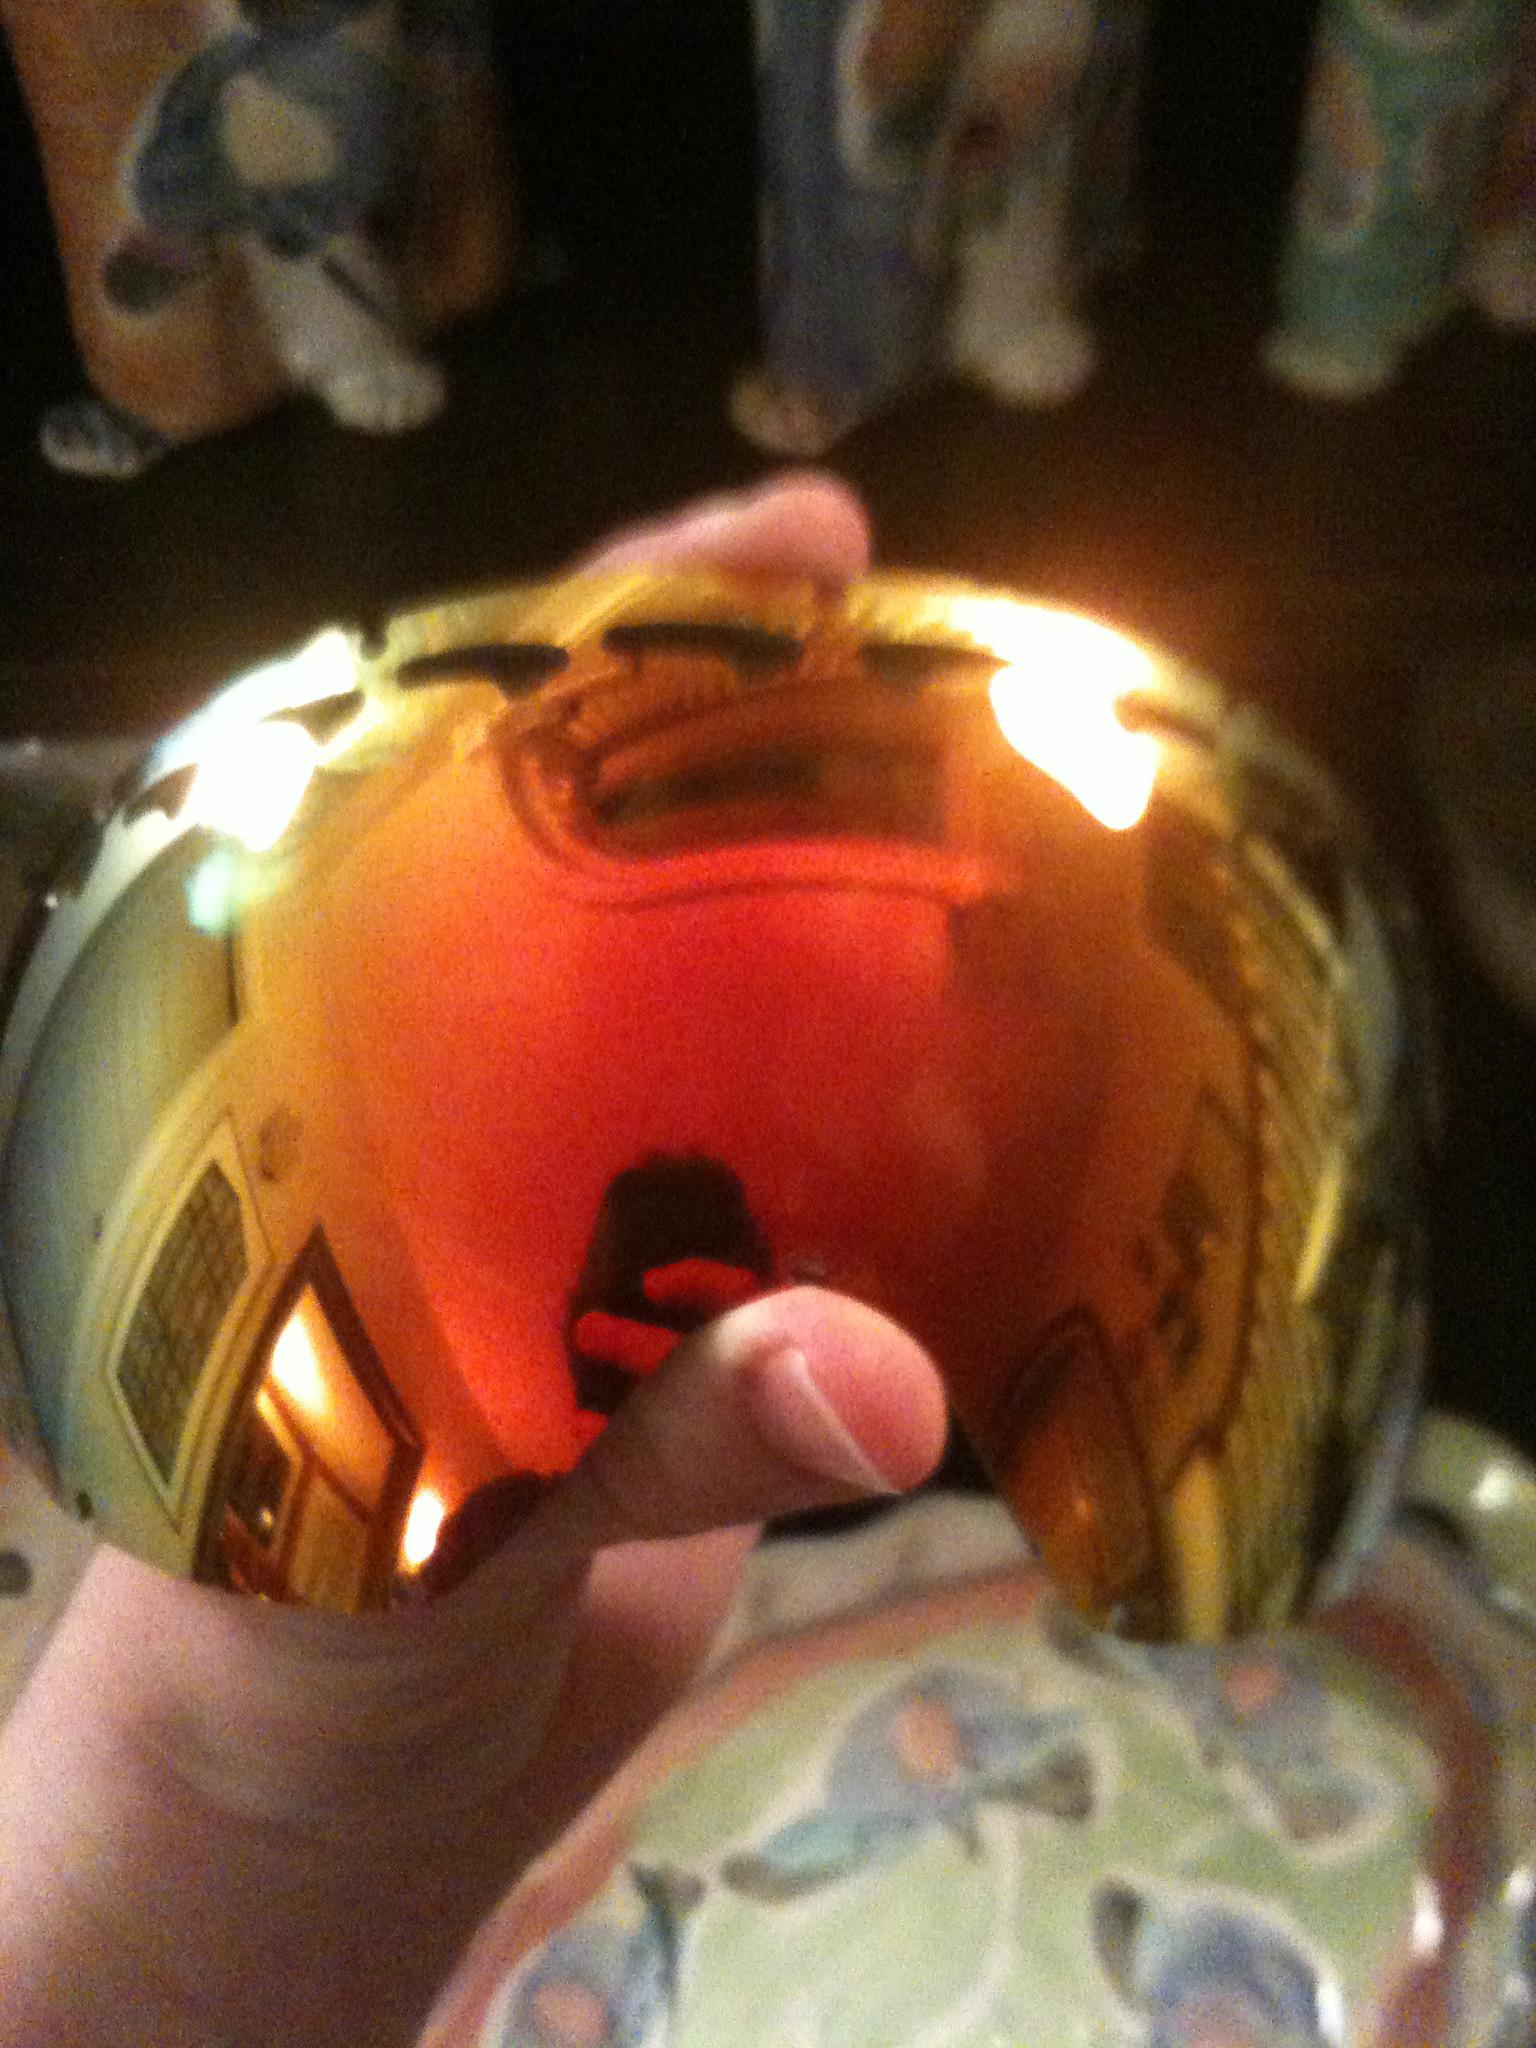 Fire Crowbar Lense-PM ME